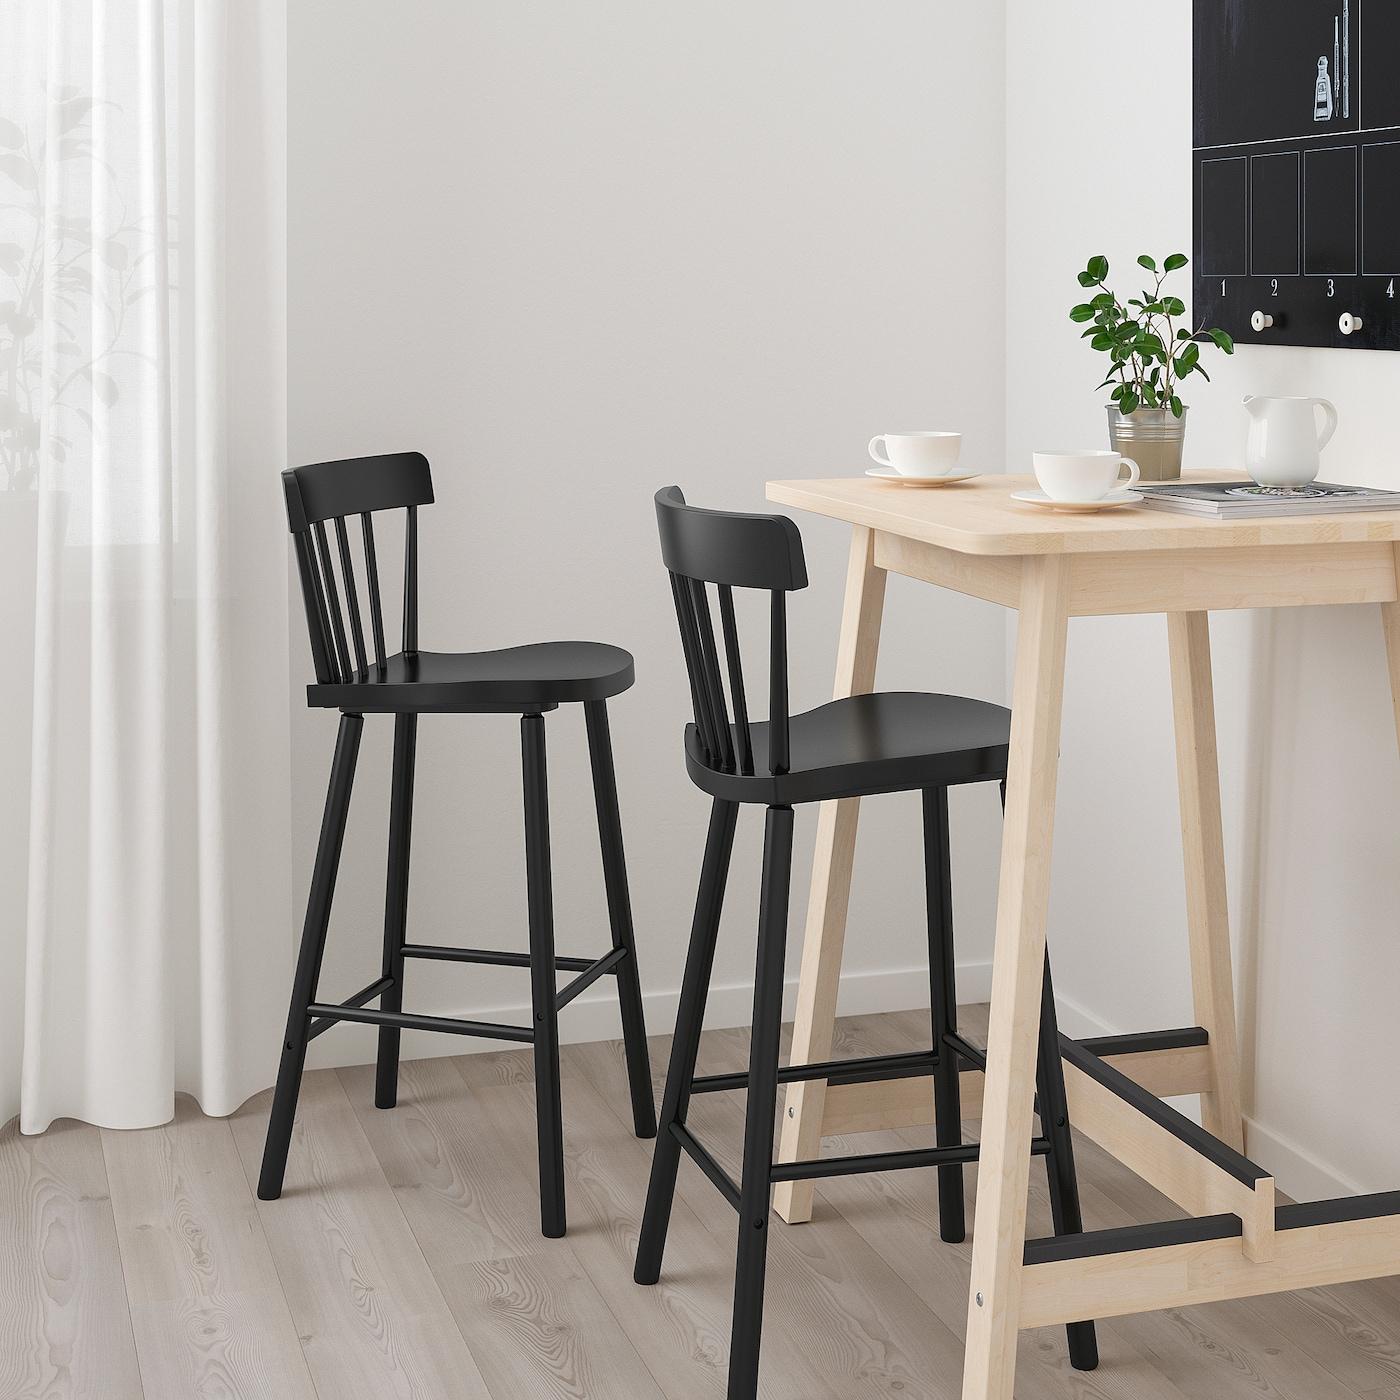 Ikea Tili